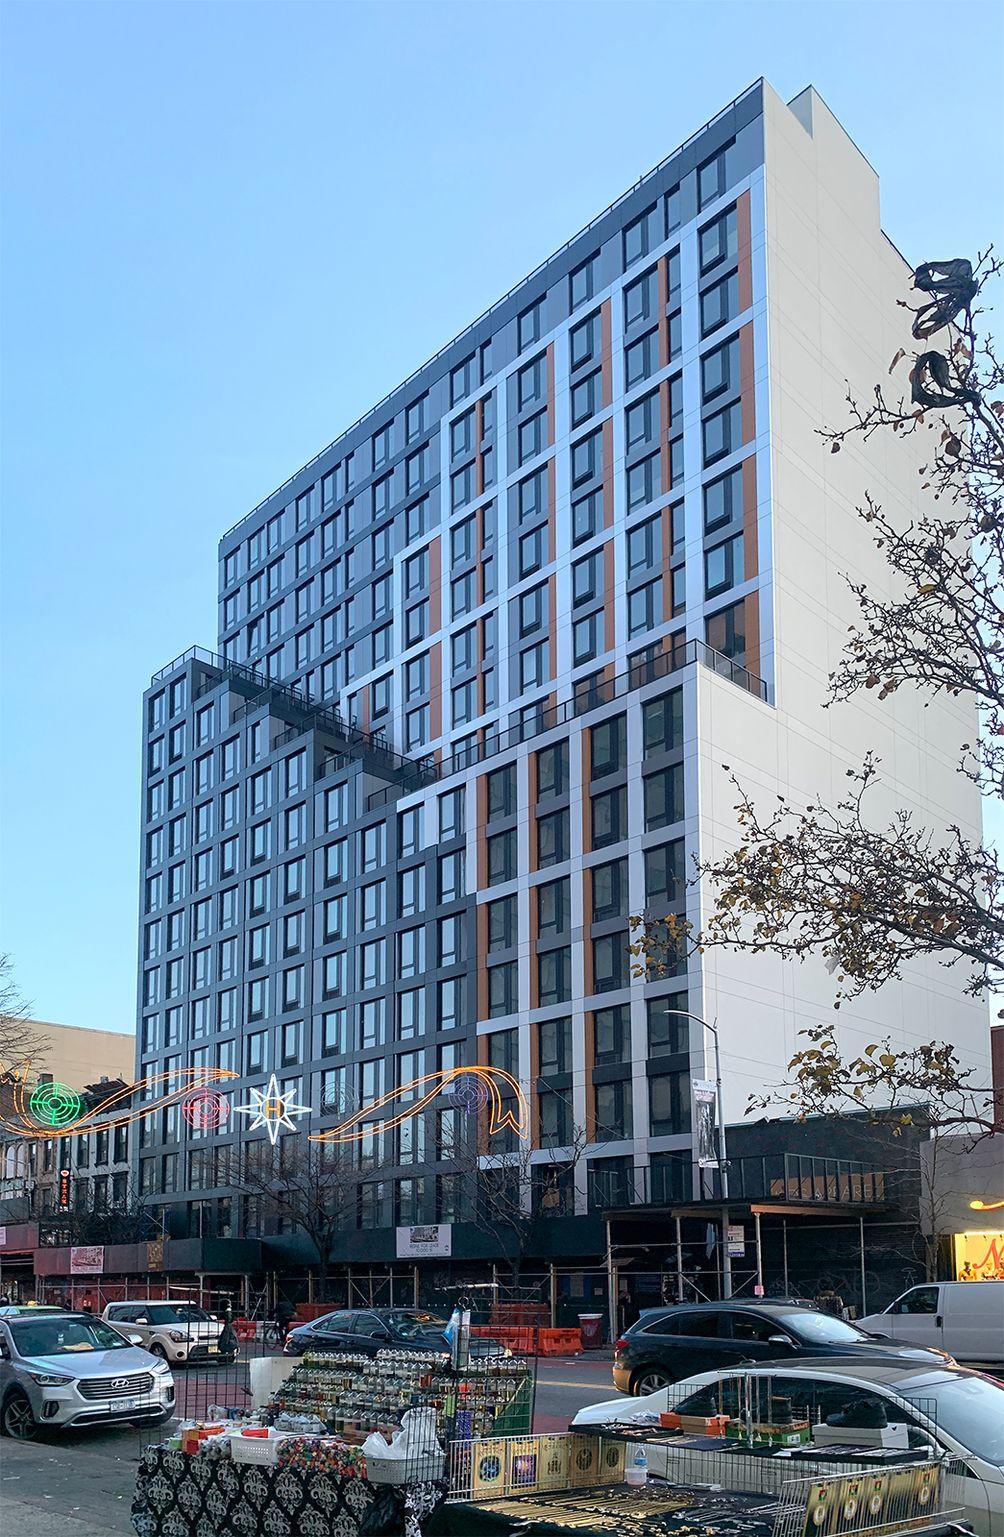 62 West 125th Street